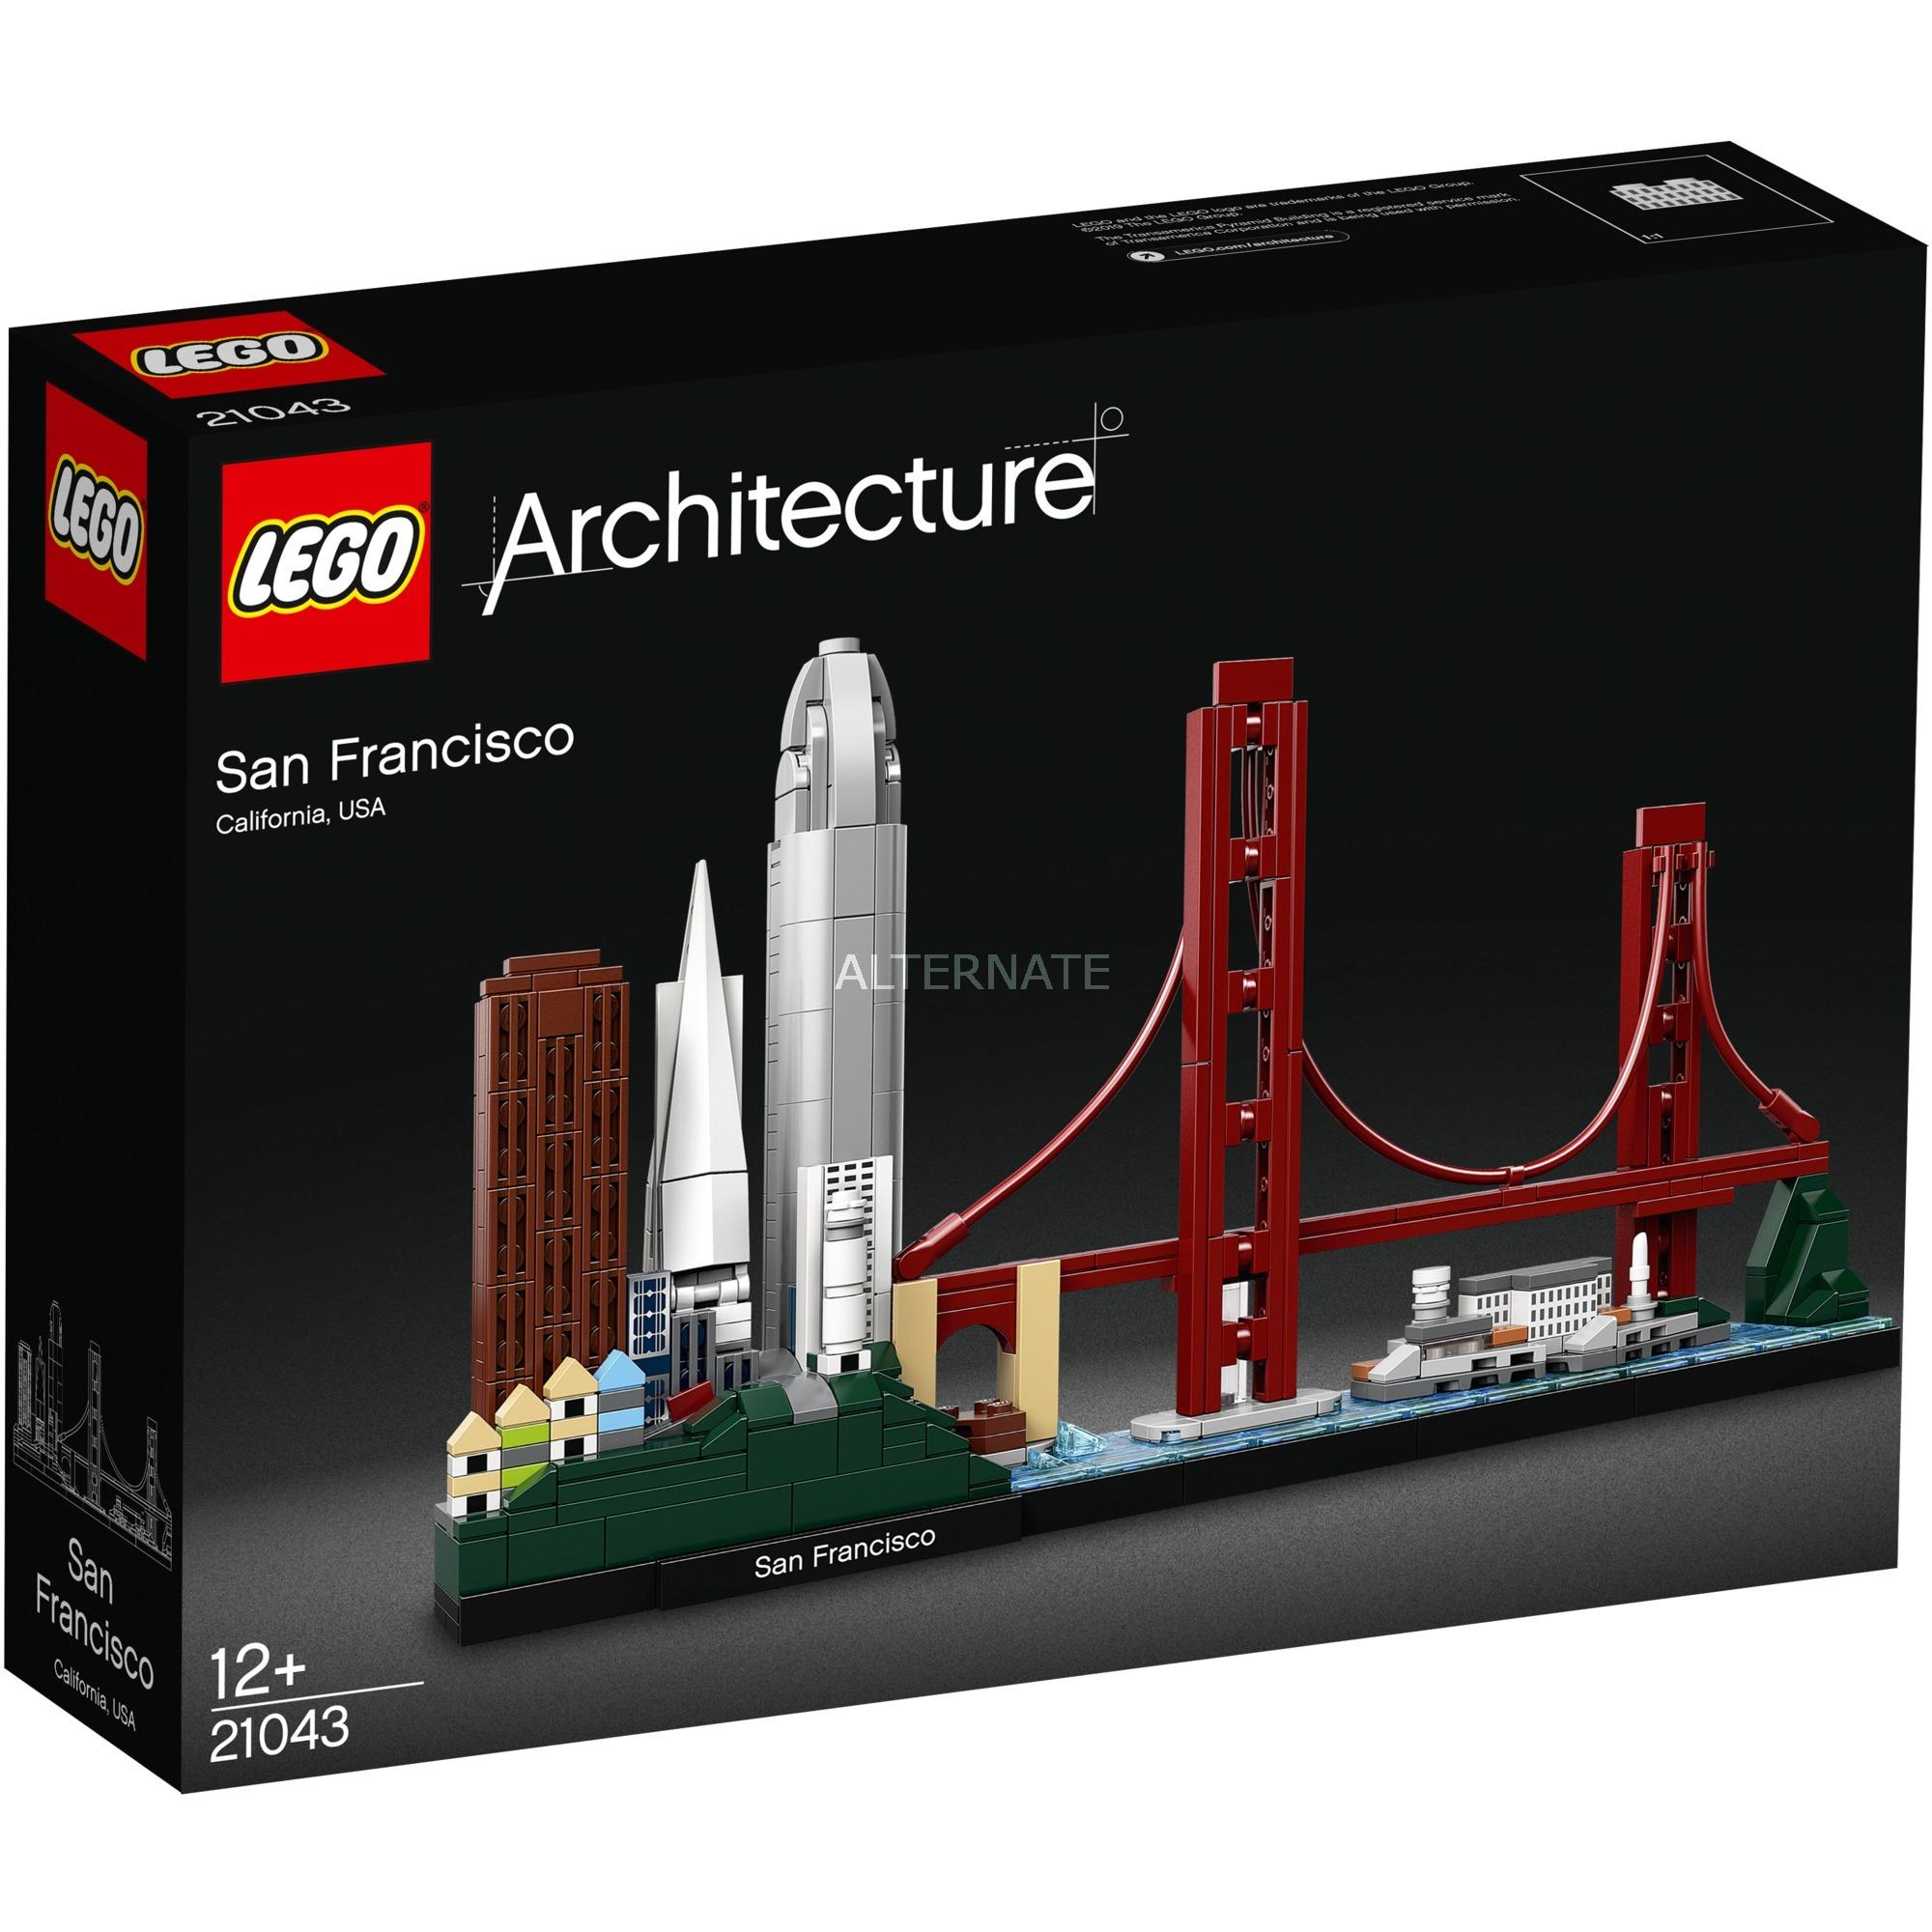 LEGO Architecture - San Francisco - 21043